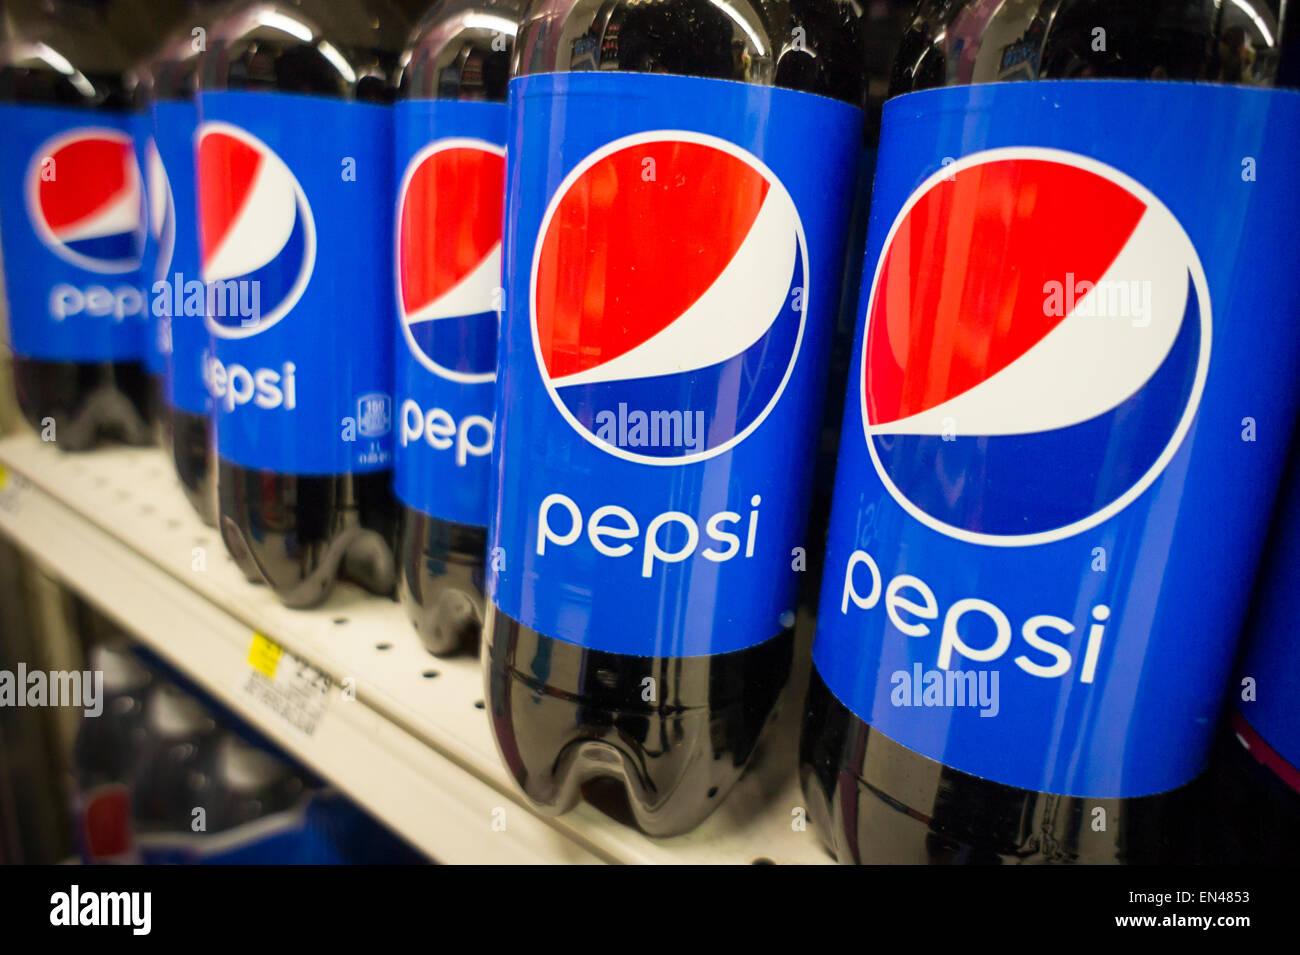 Kleiner Pepsi Kühlschrank : Pepsi cola store stockfotos pepsi cola store bilder alamy